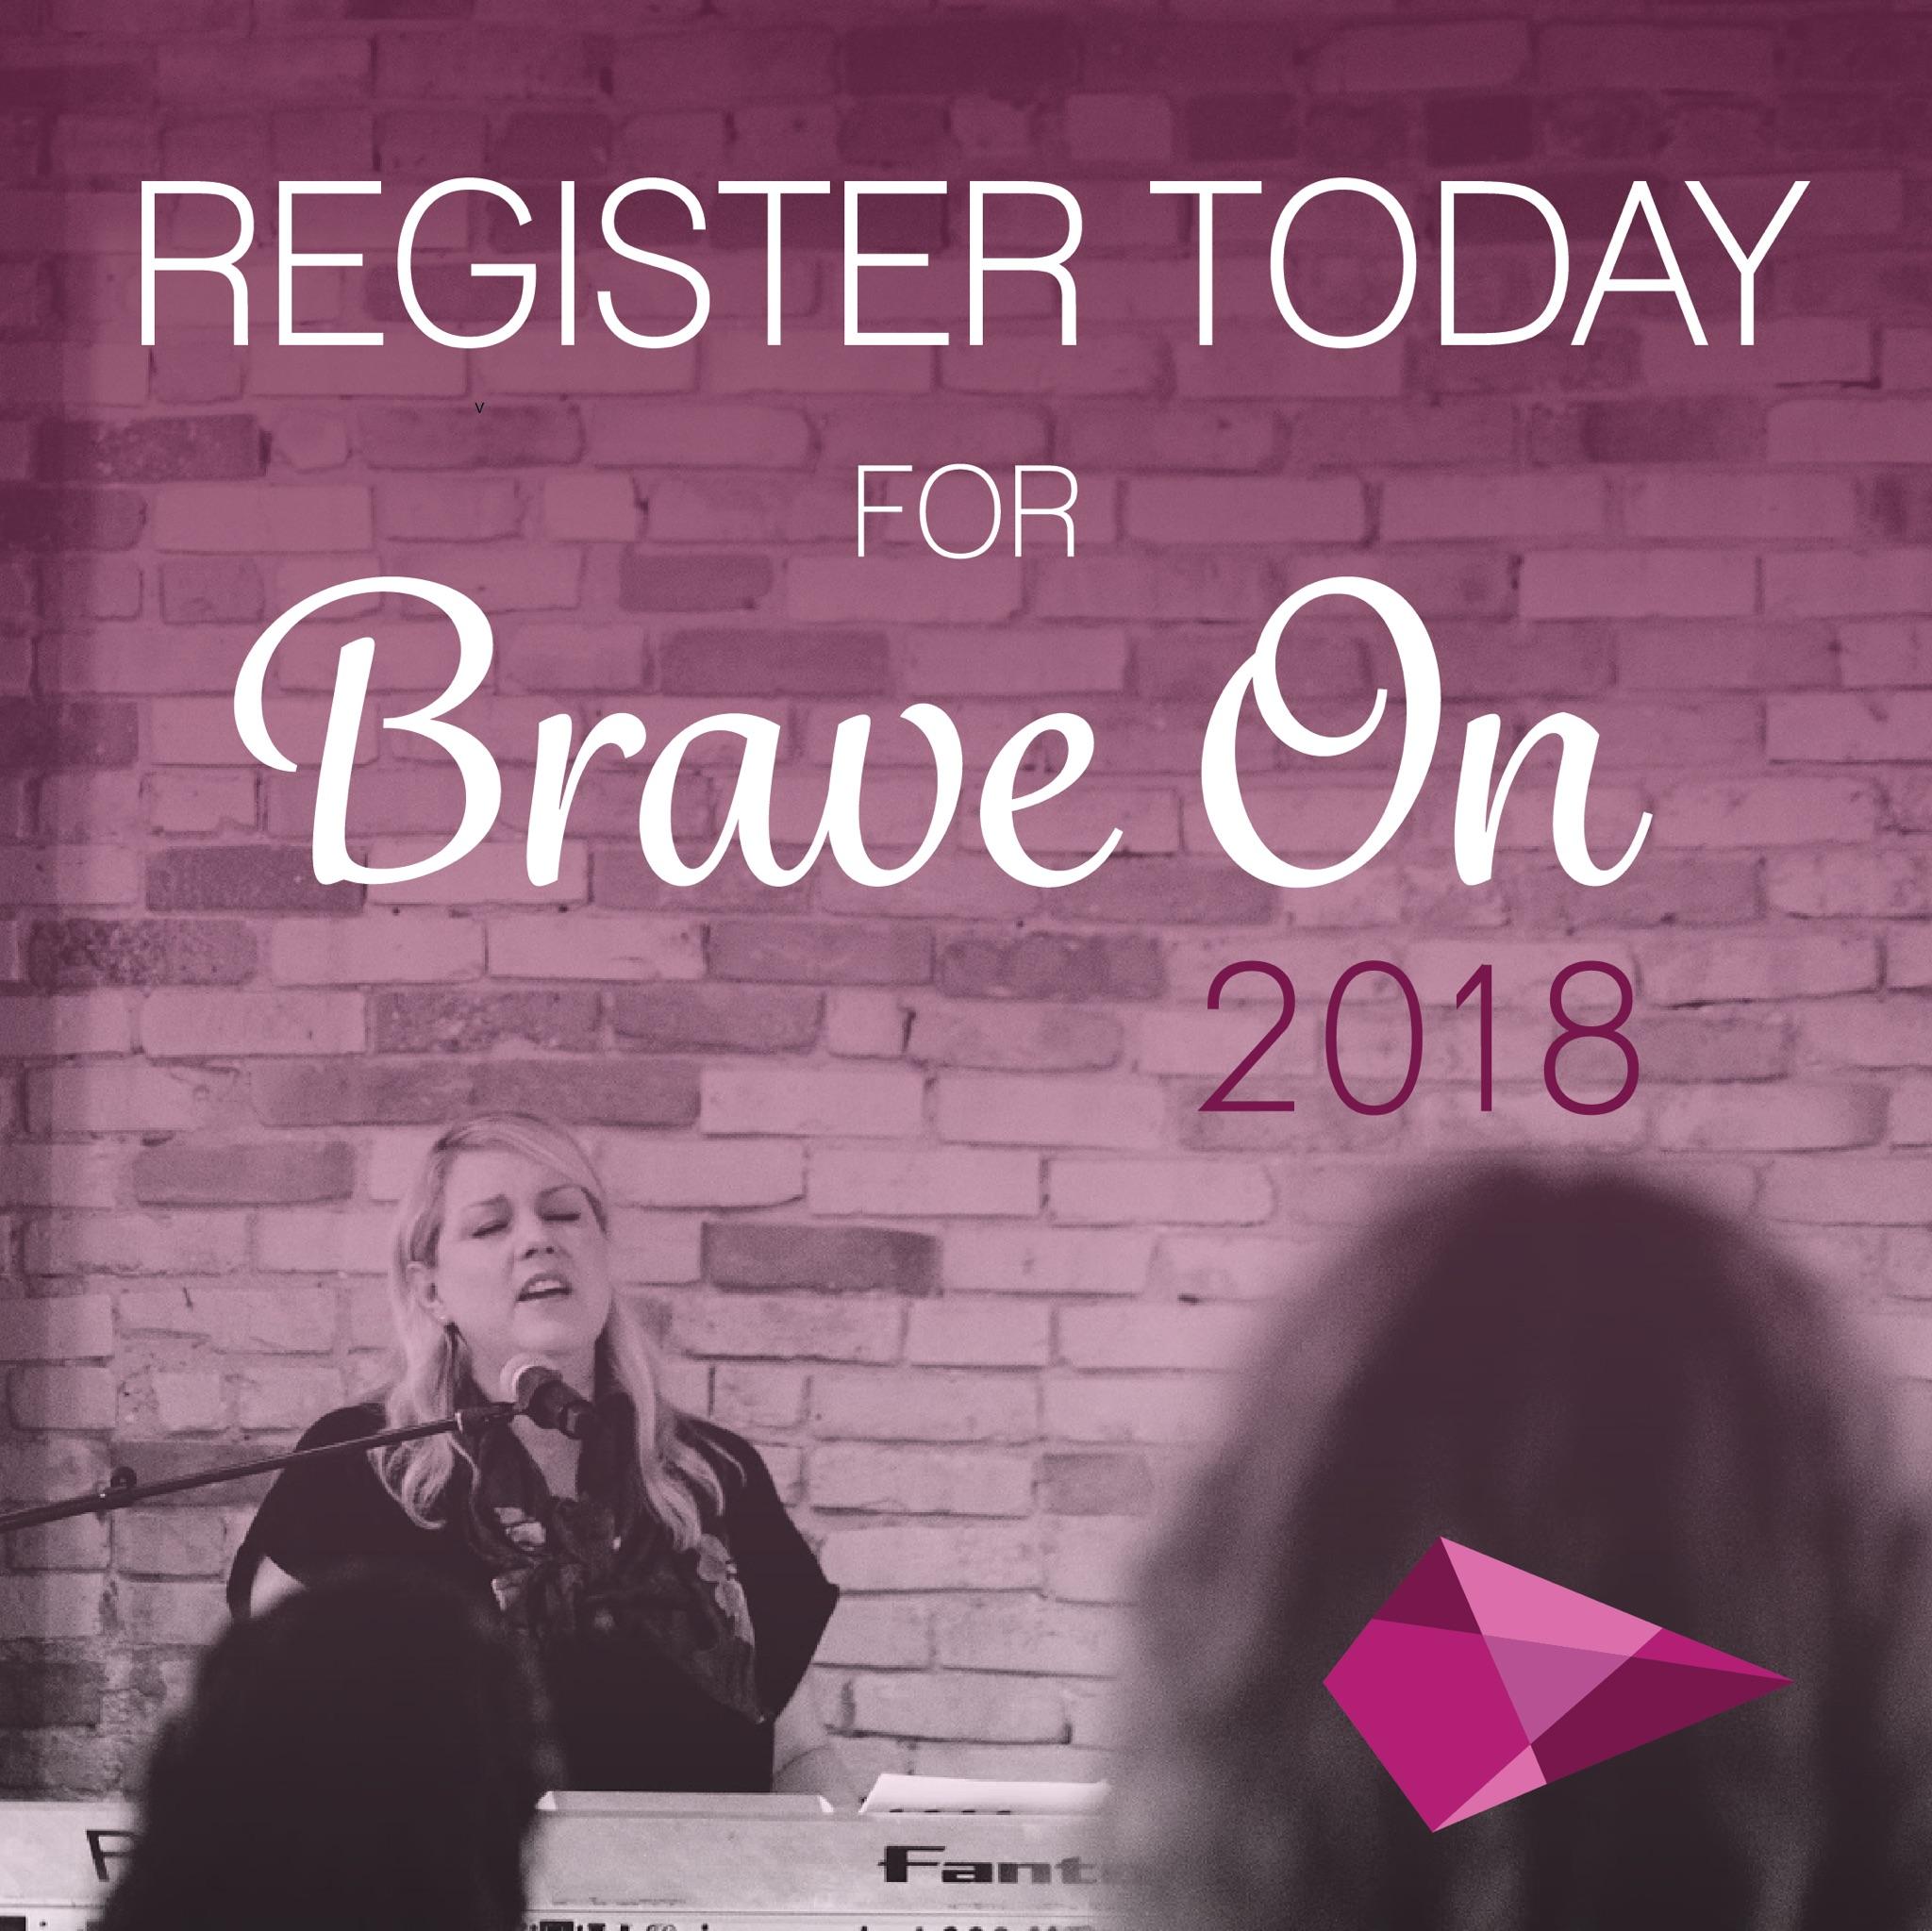 Register Today for Brave On 2018